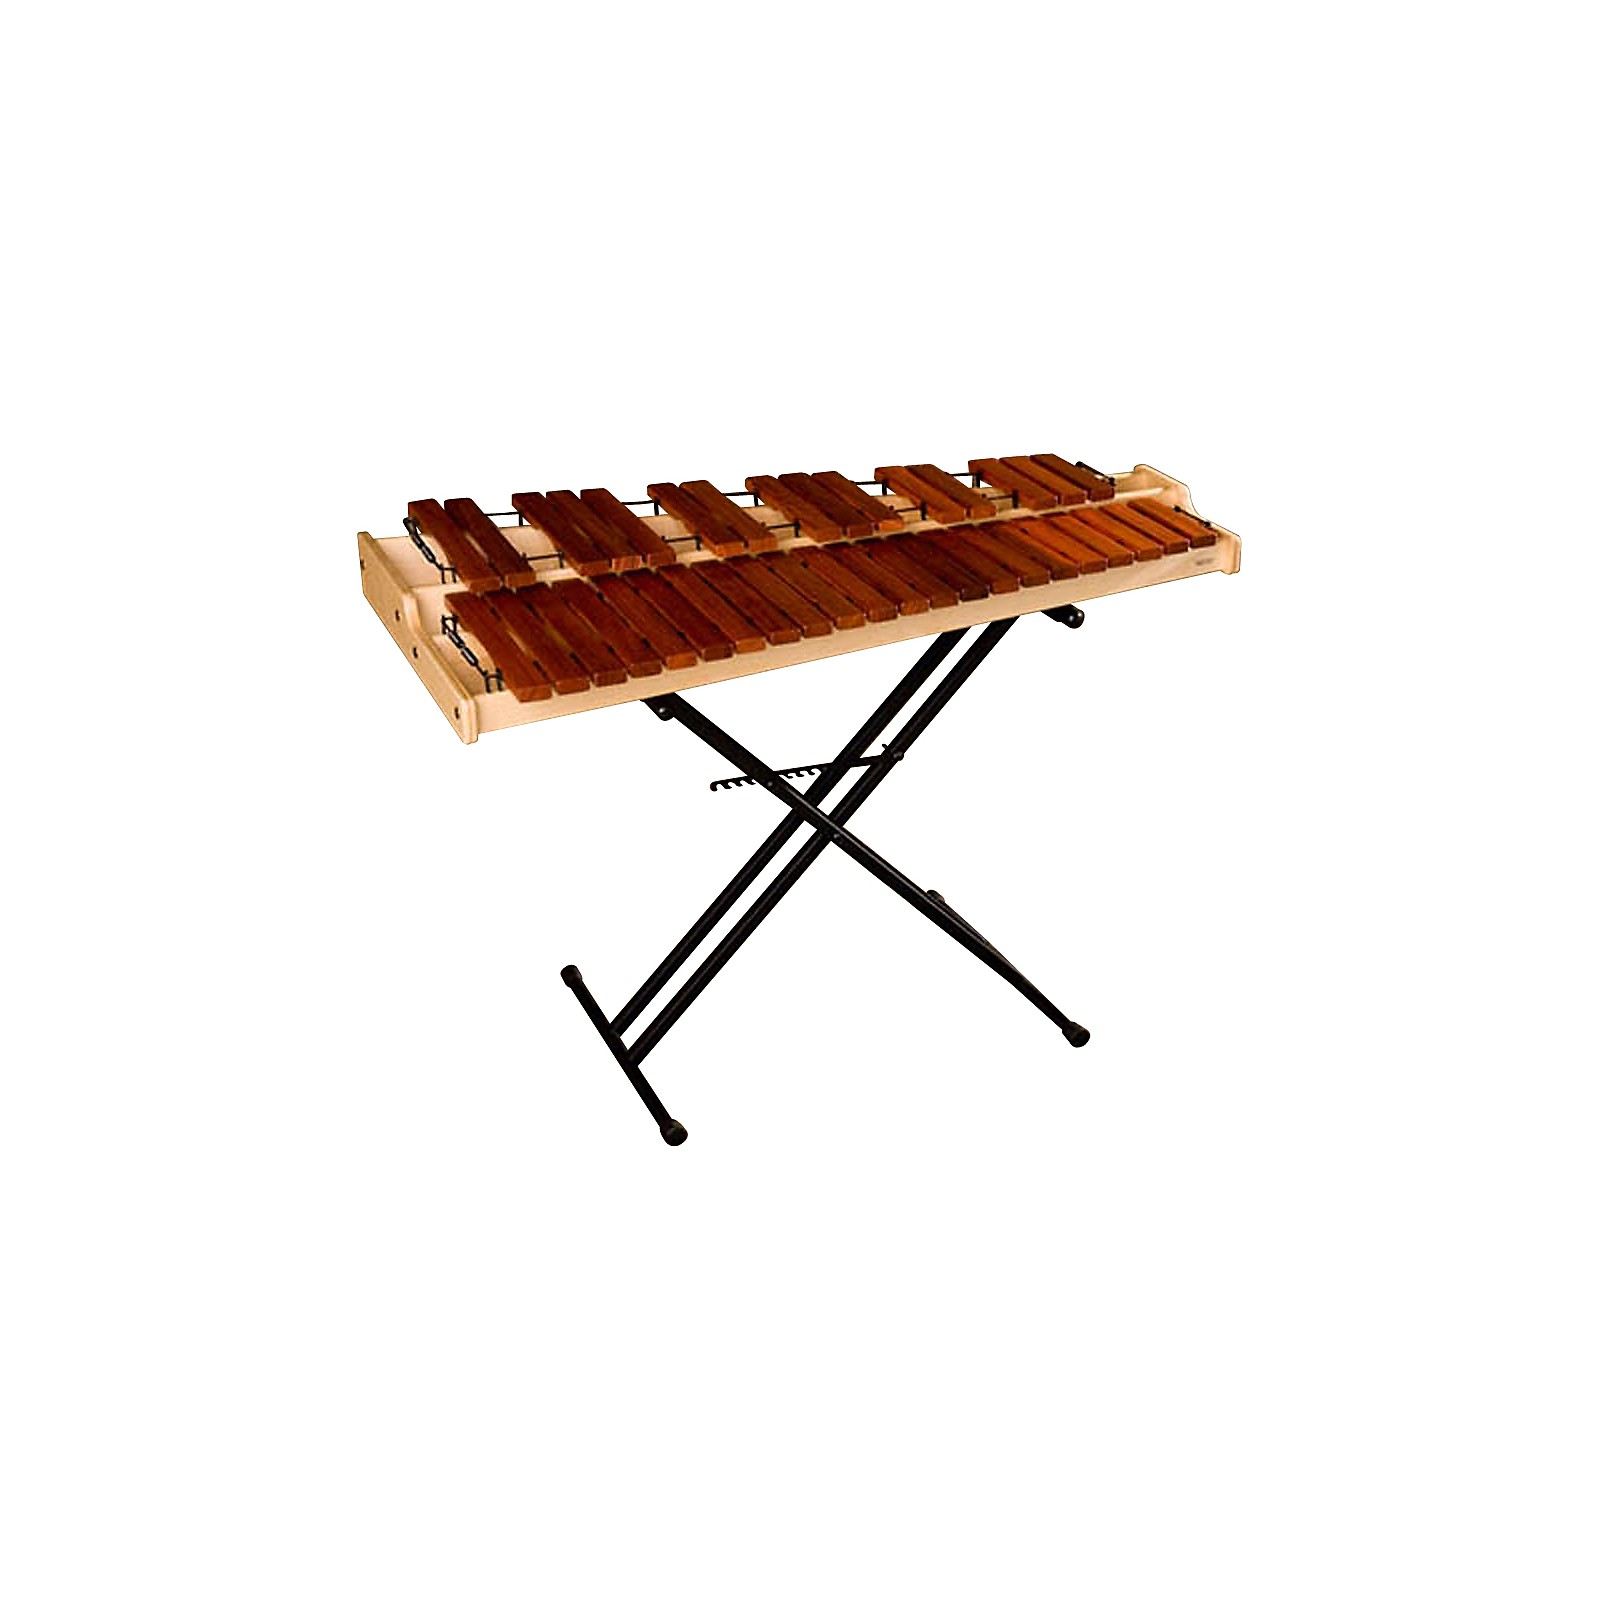 Marimba Warehouse MPM Maxey 3-Octave Practice Marimba with Stand